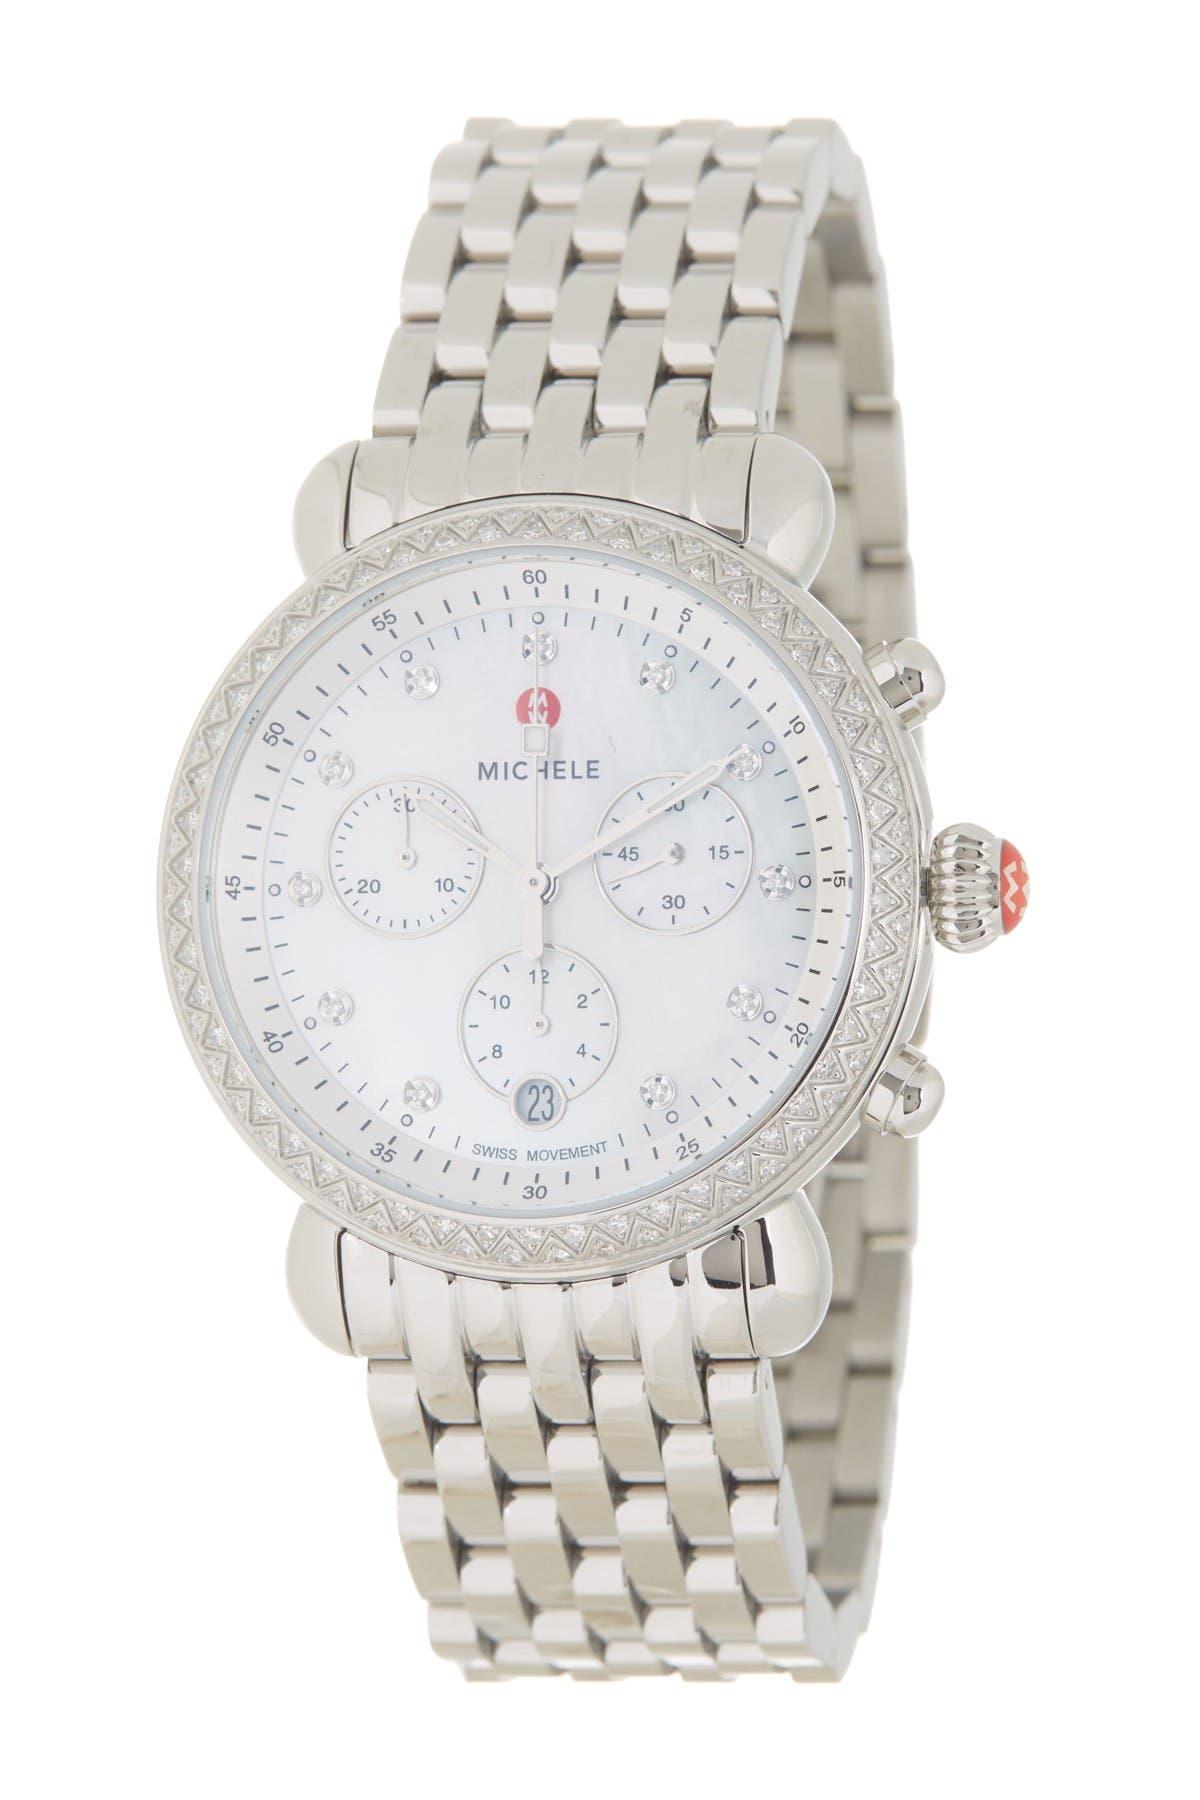 Image of Michele Women's CSX Diamond Embellished Bracelet Watch, 37mm